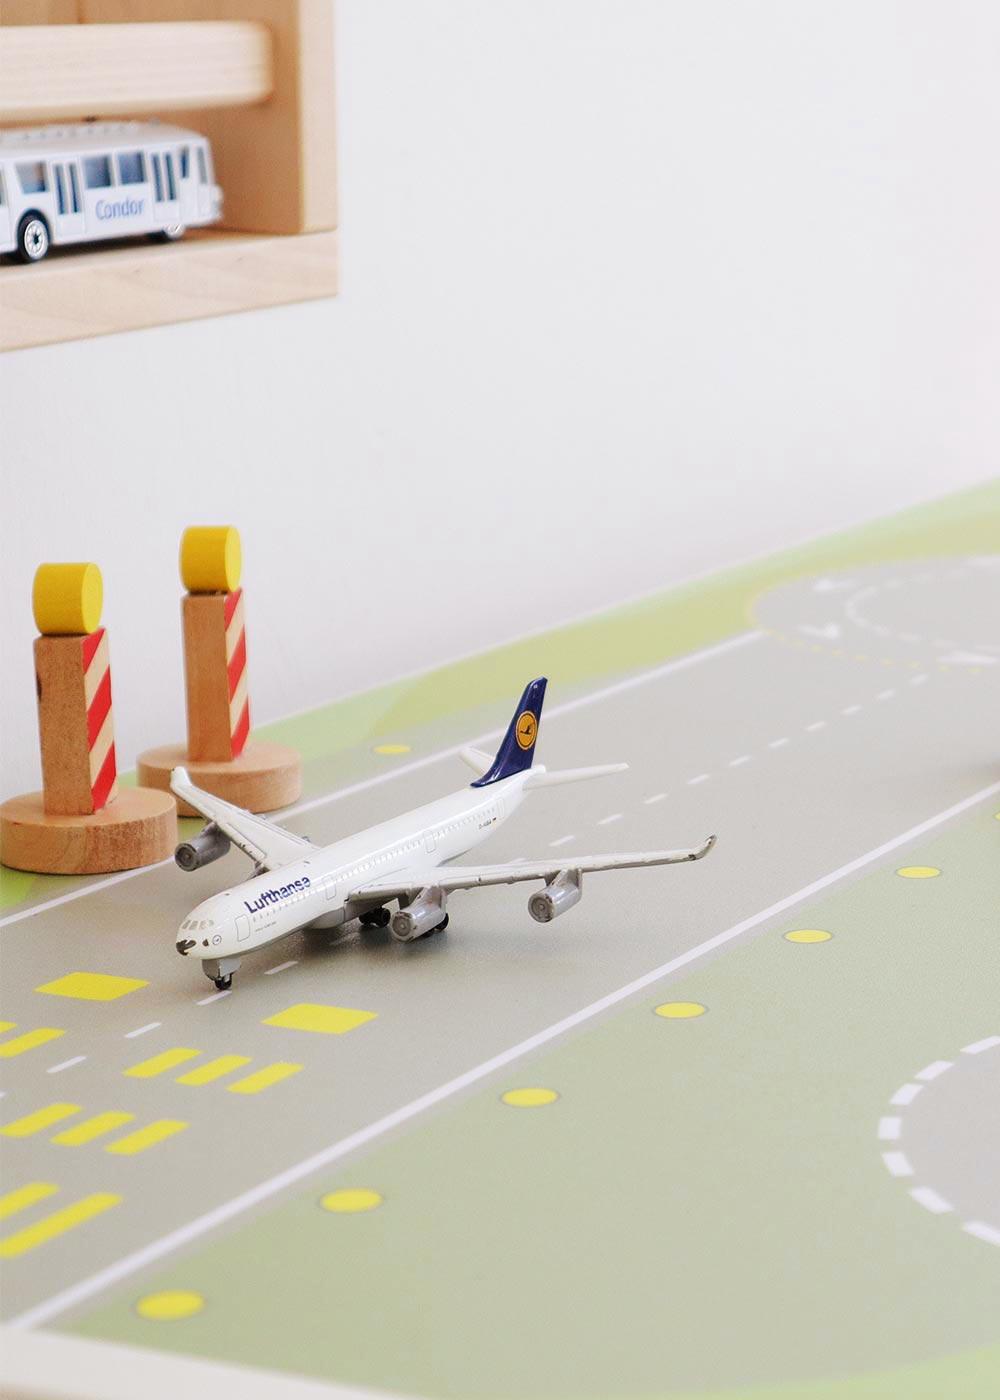 Ikea Trofast Regal Landebahn Teilansicht Landung